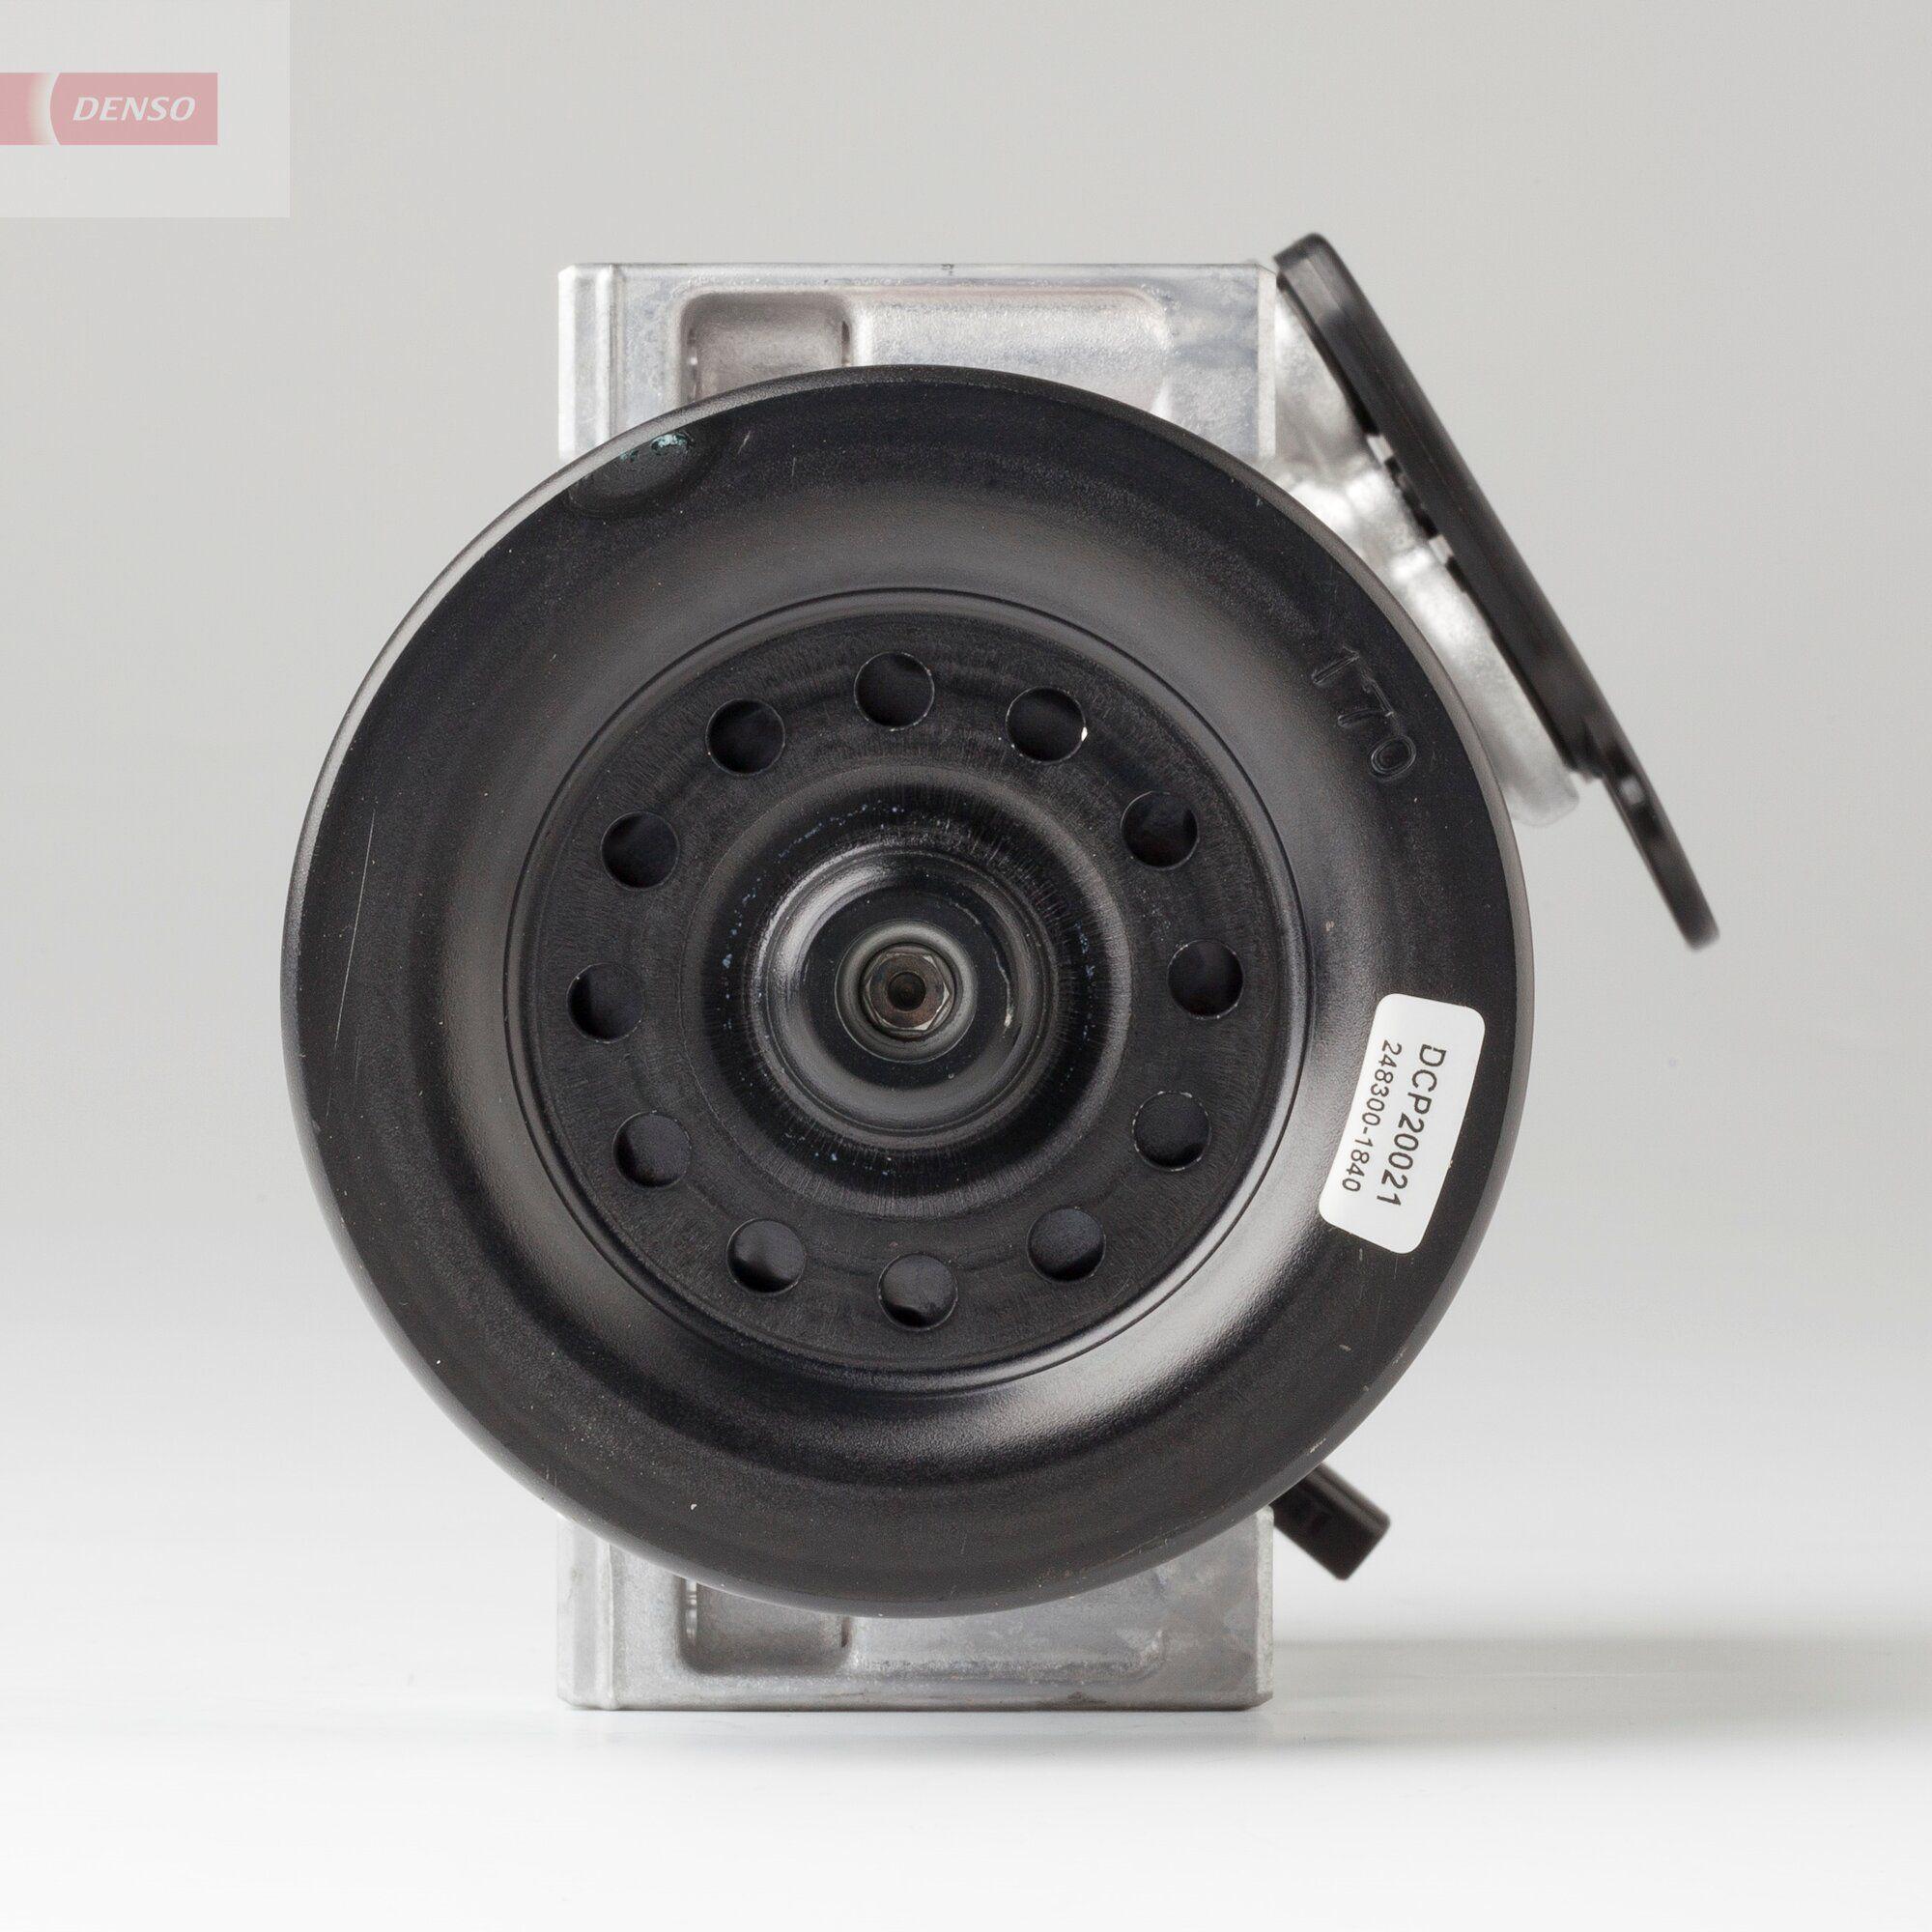 DCP50301 Klimaanlage Kompressor DENSO - Markenprodukte billig